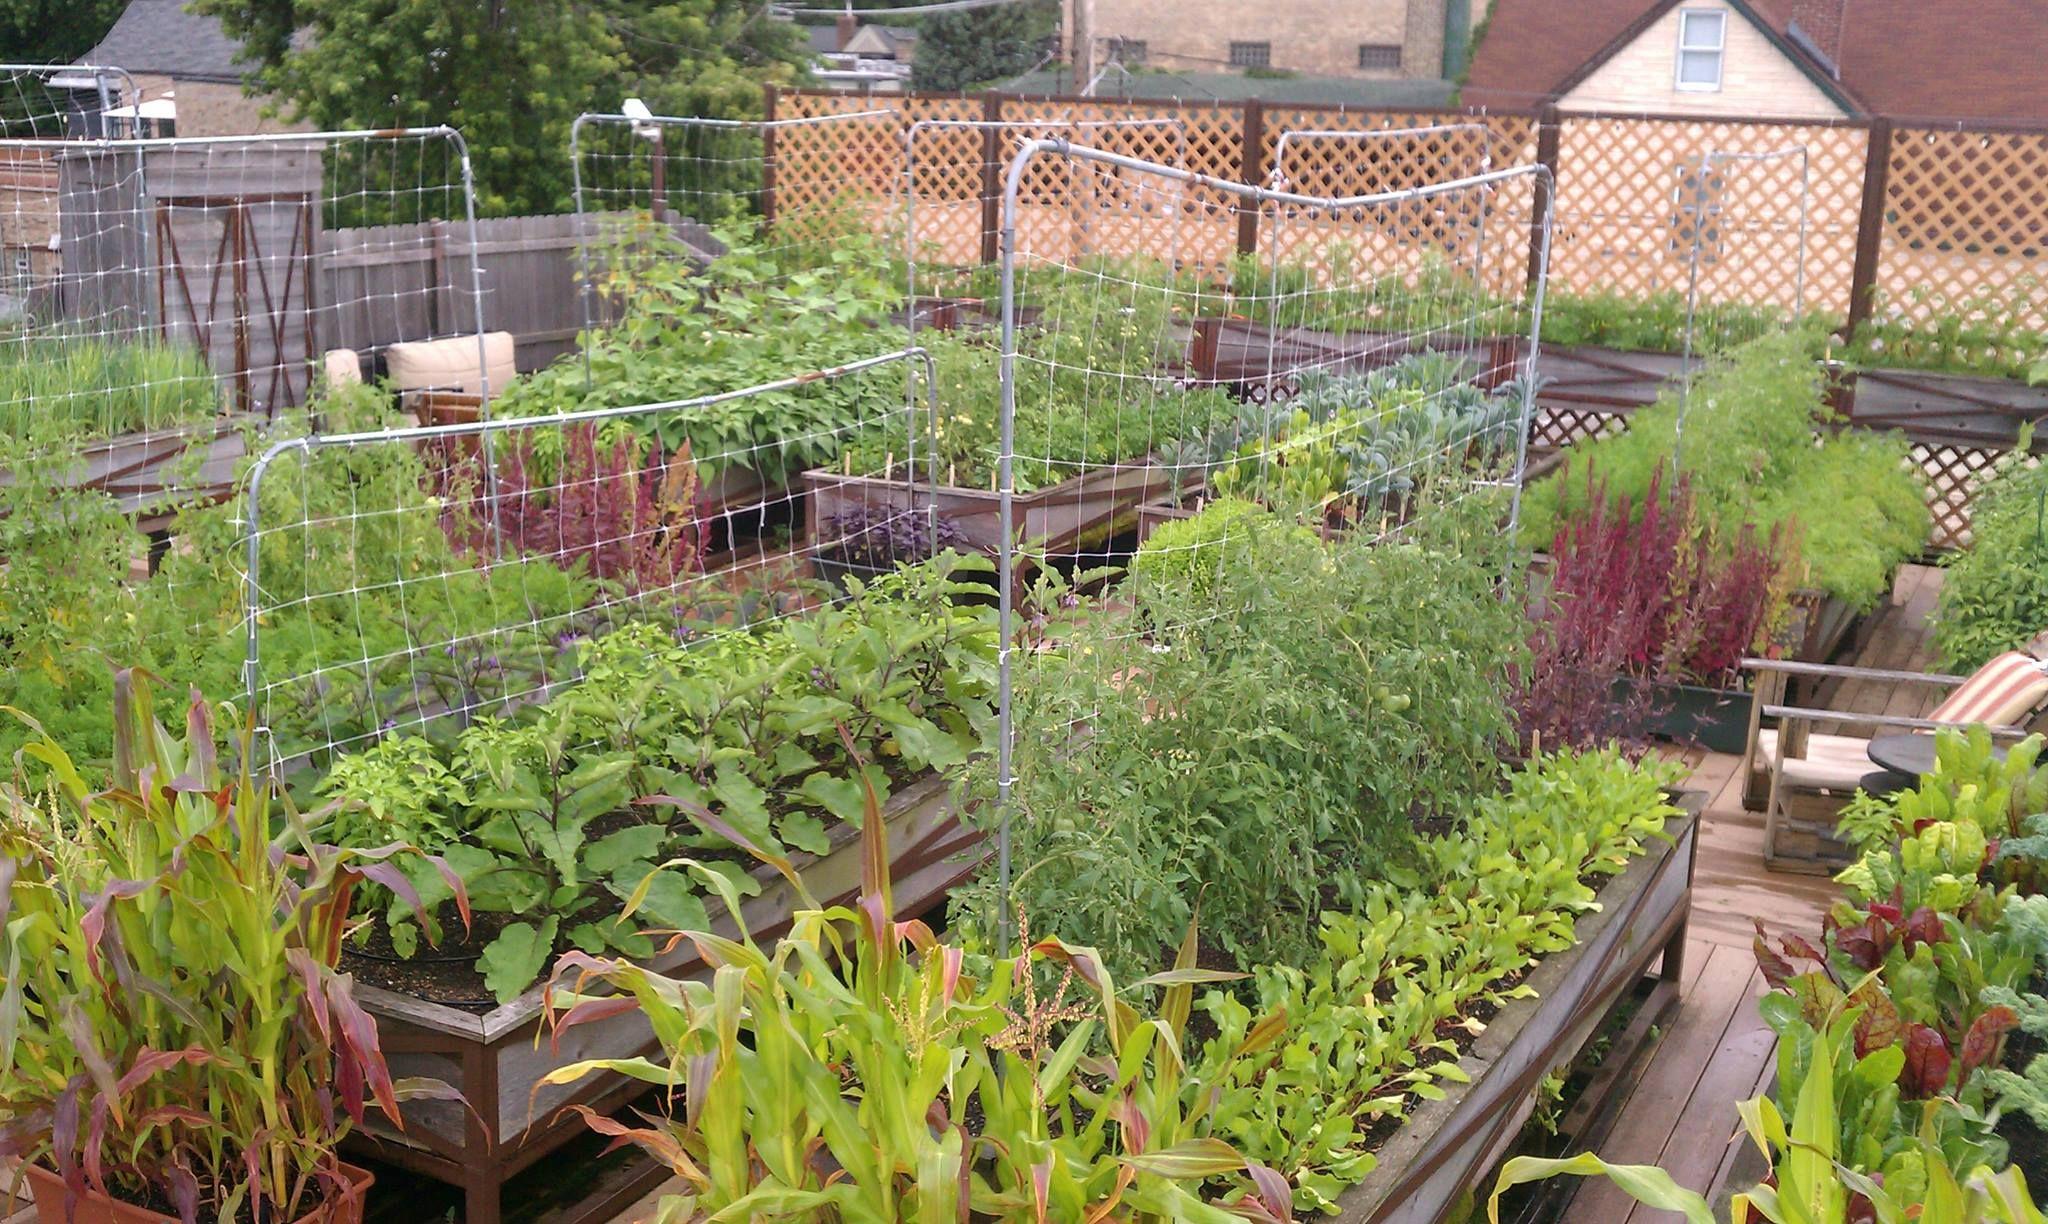 farm uncommon ground on 1401 devon ave chicago is the